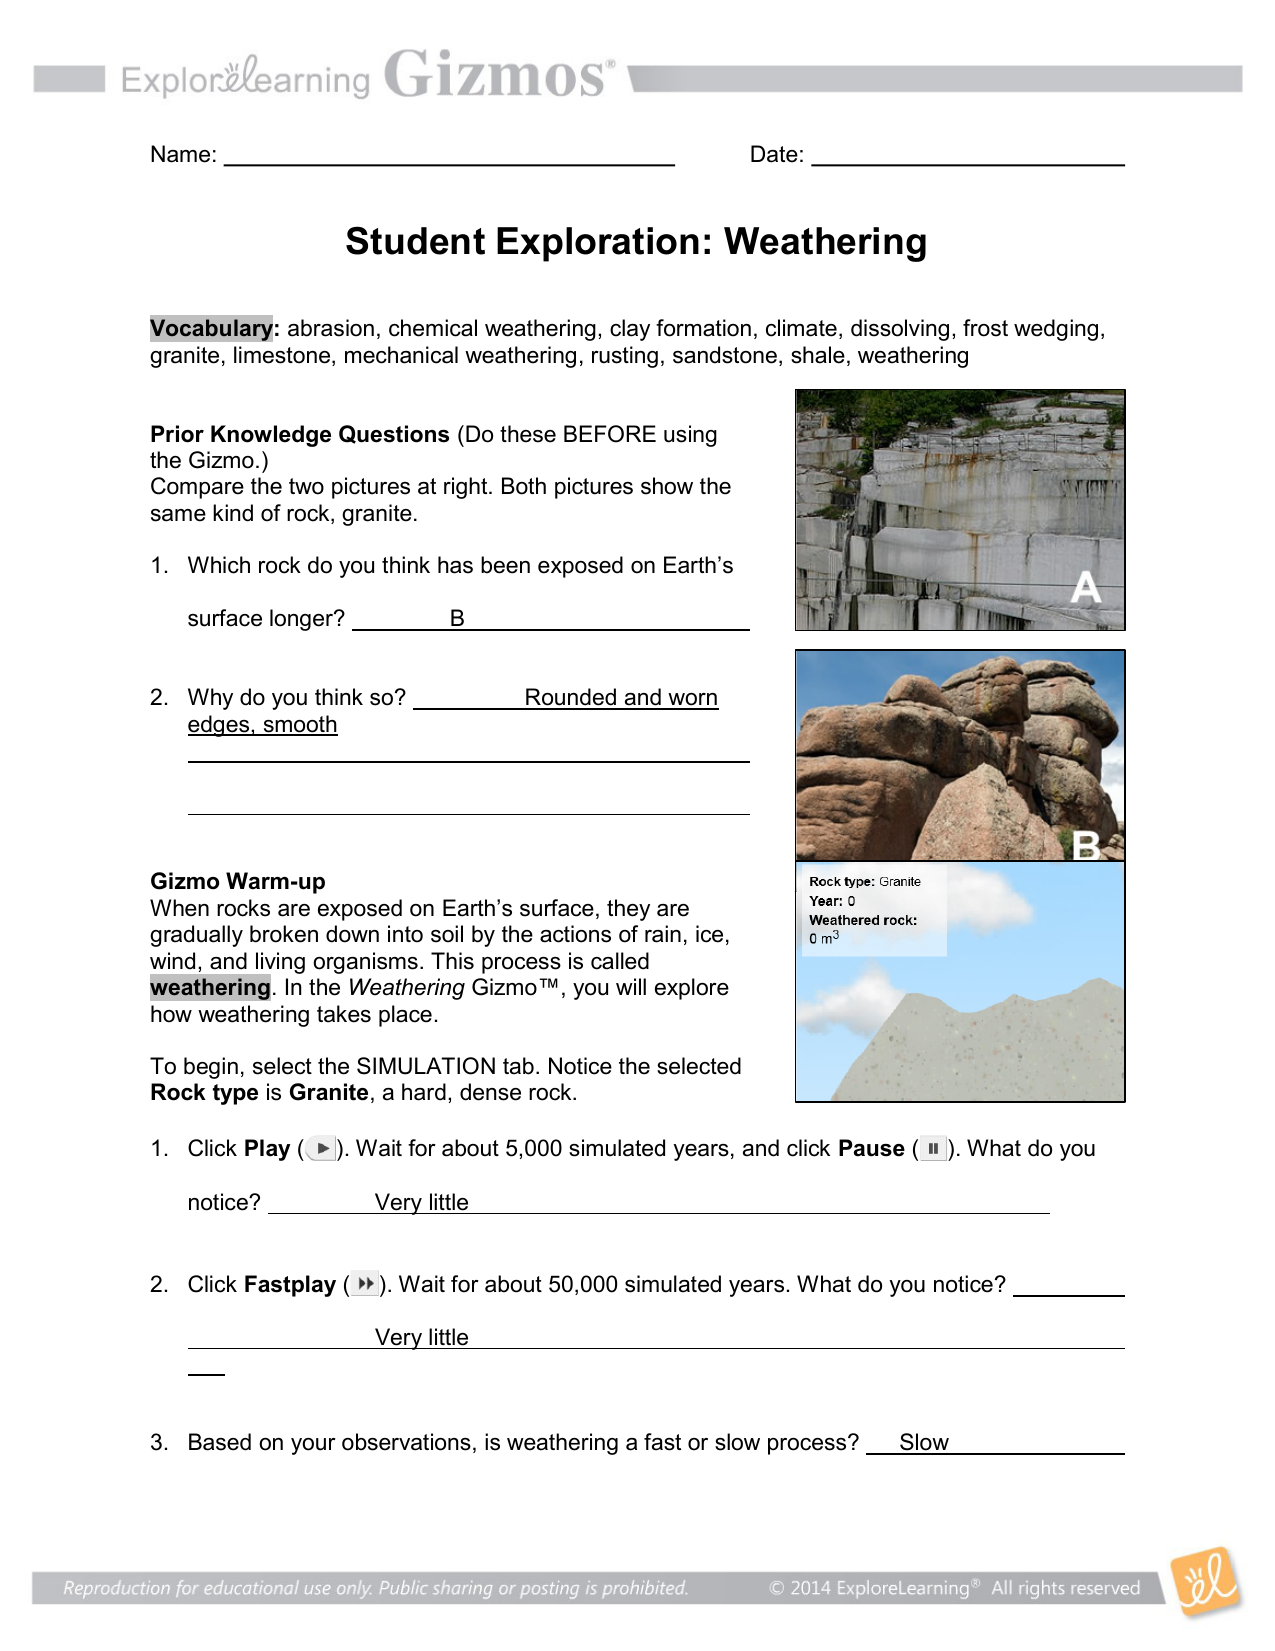 Student Exploration Weathering